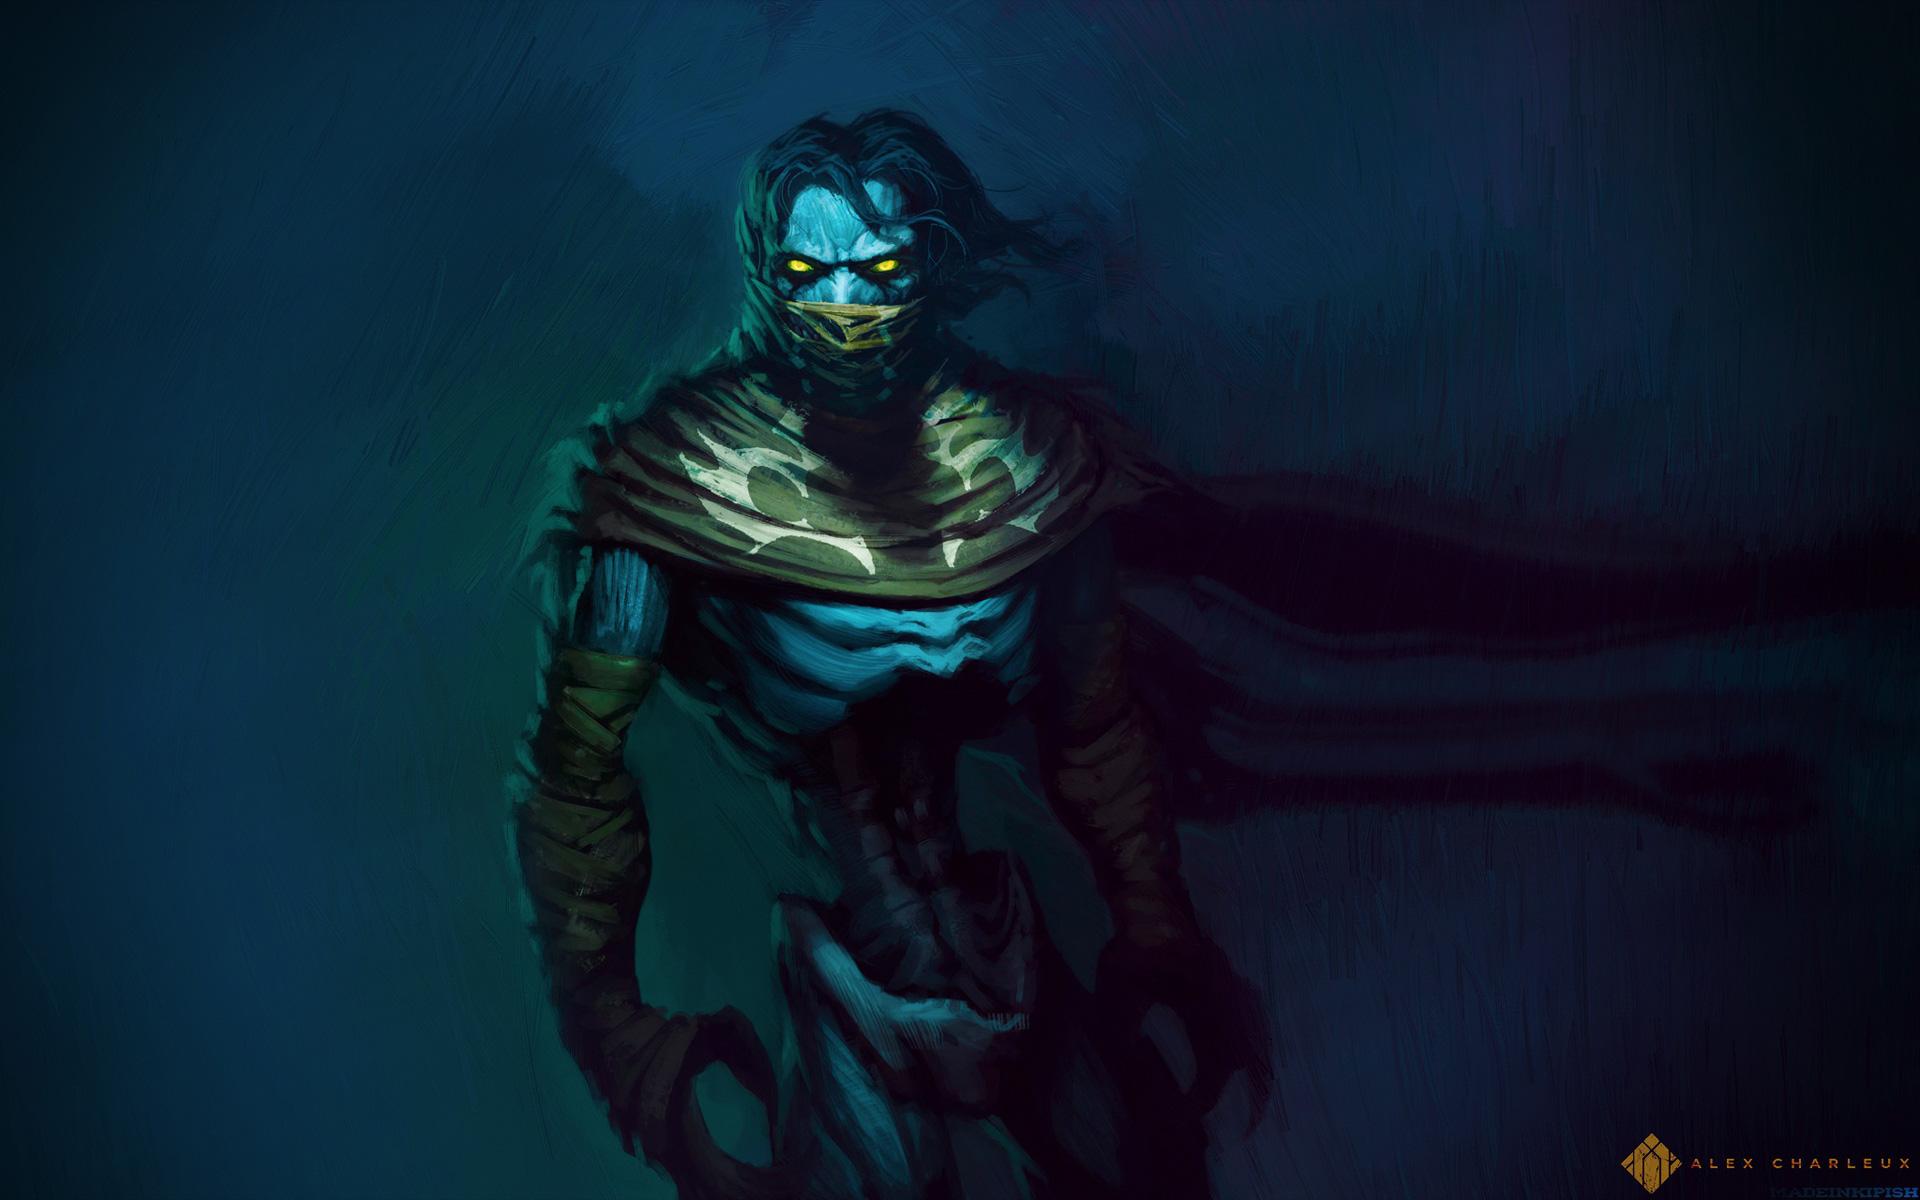 Free Legacy of Kain: Soul Reaver Wallpaper in 1920x1200